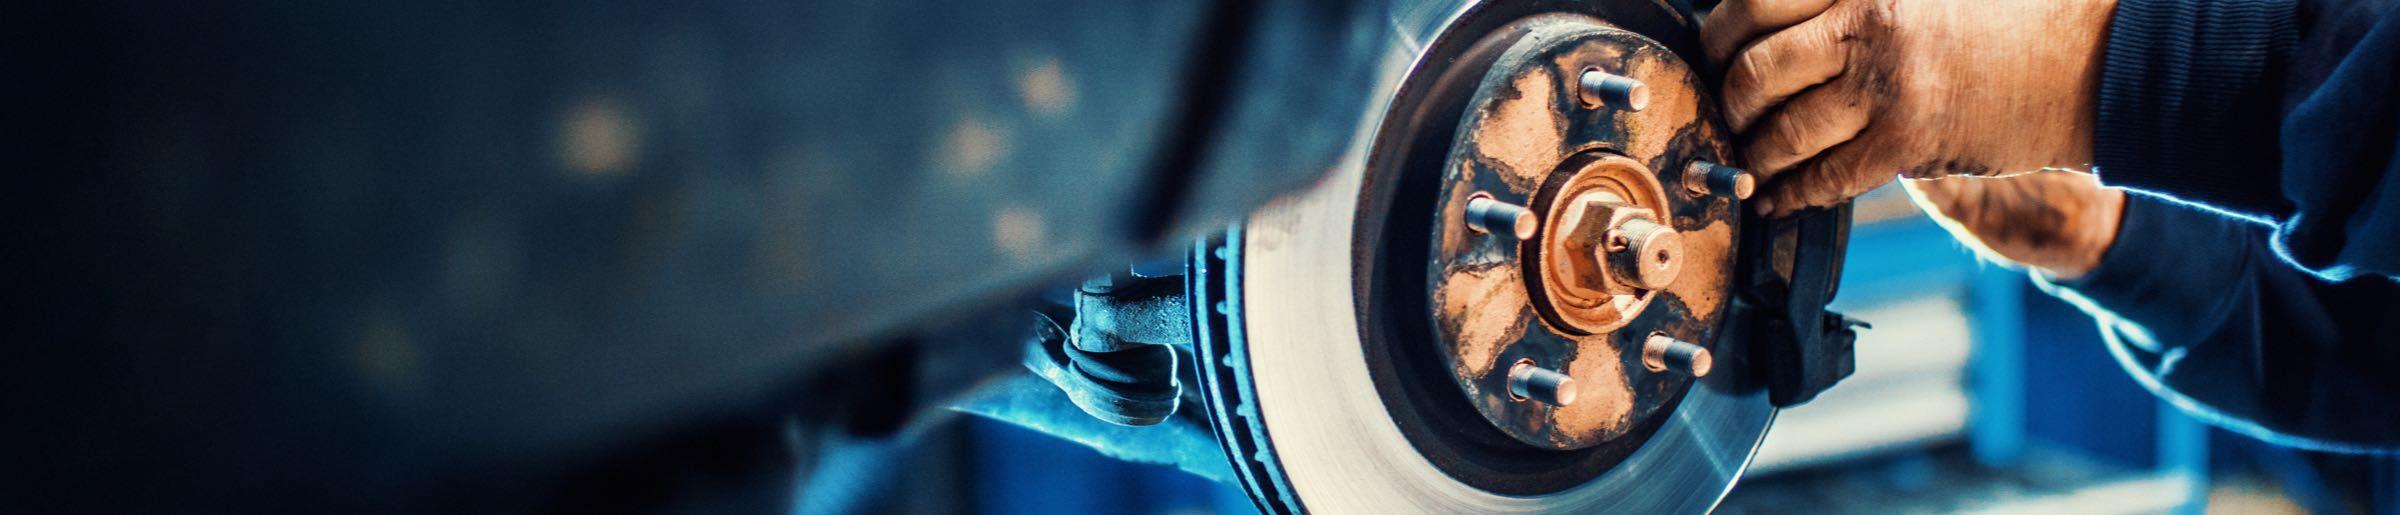 Brakes Repairs & Servicing | ABS Automotive Service Centres